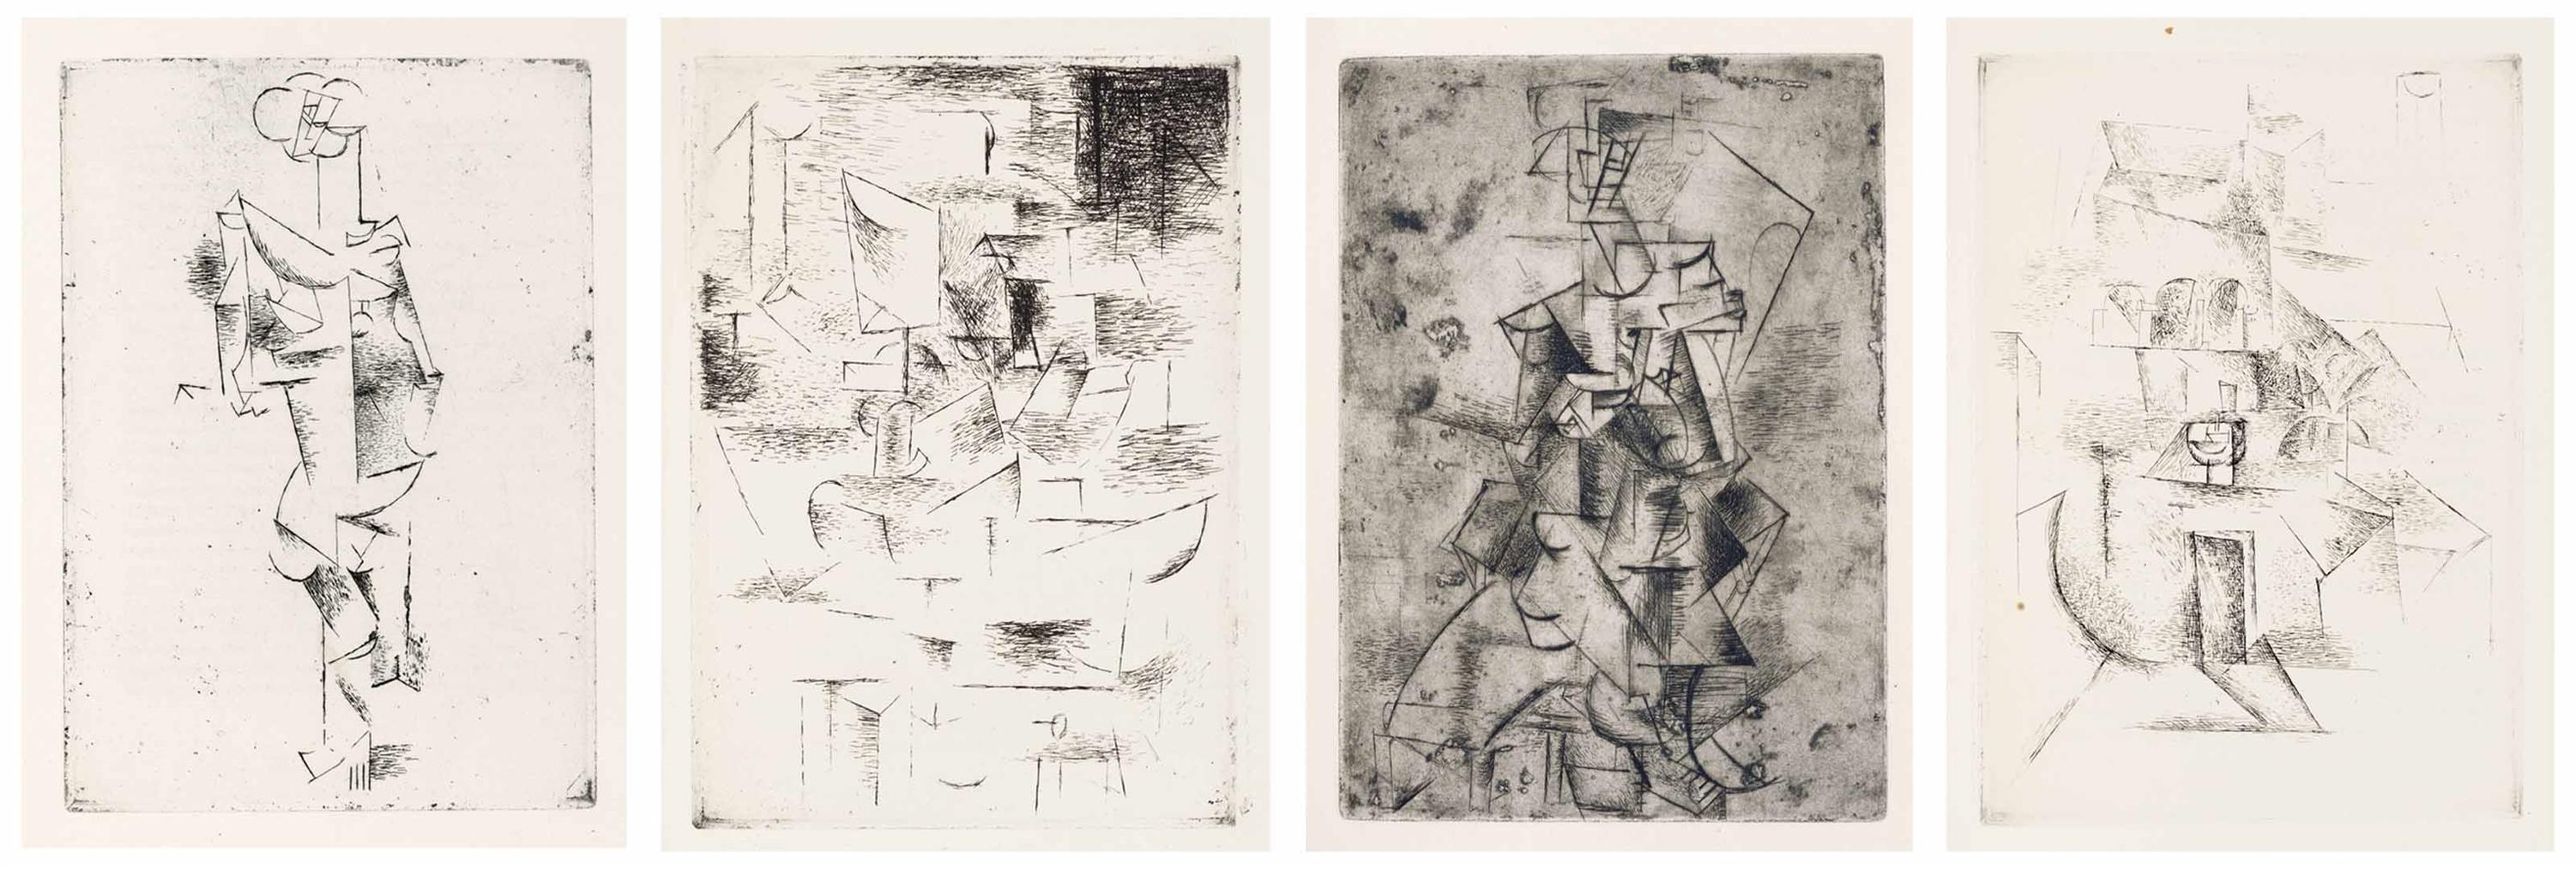 Pablo Picasso-Max Jacob, Saint Matorel, Henry Kahnweiler, Paris-1911